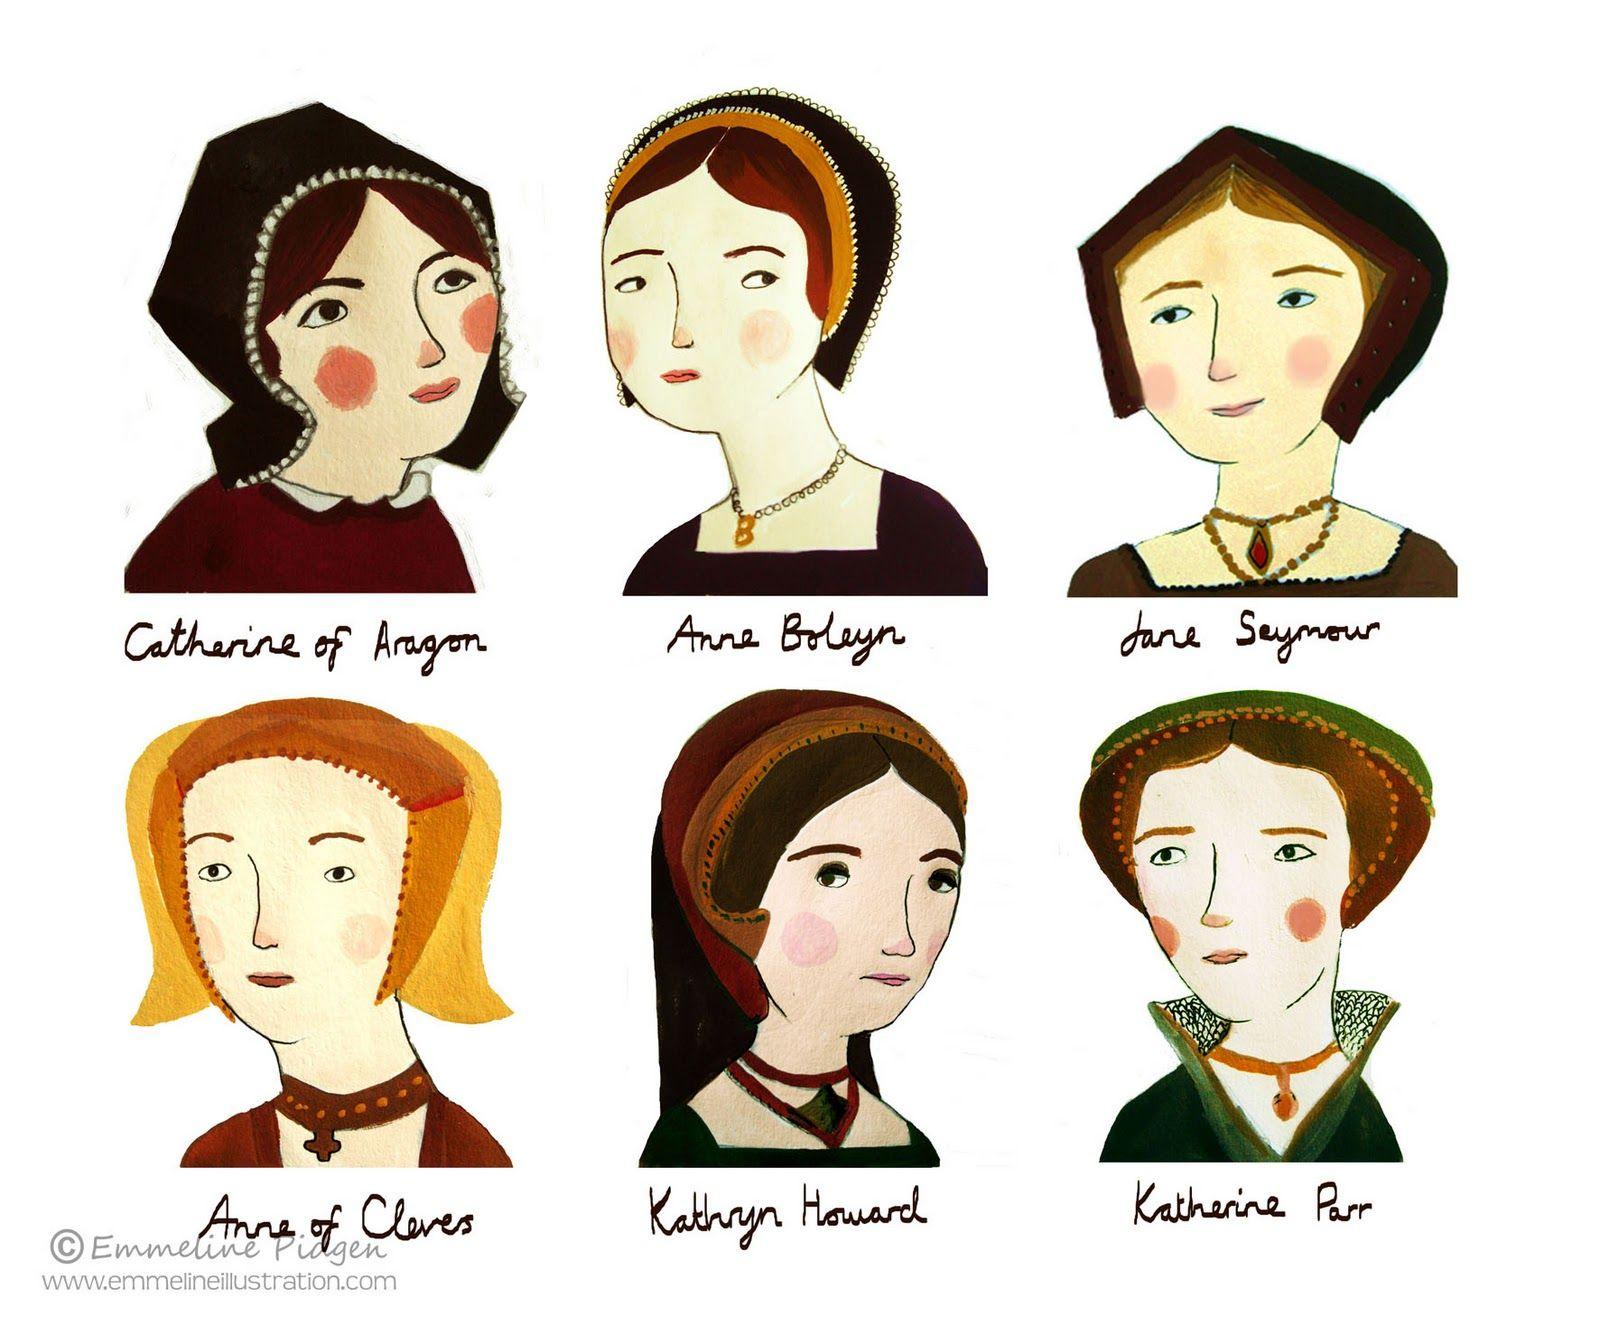 Six Wives Of Henry Viii By Emmeline Pidgen They All Look